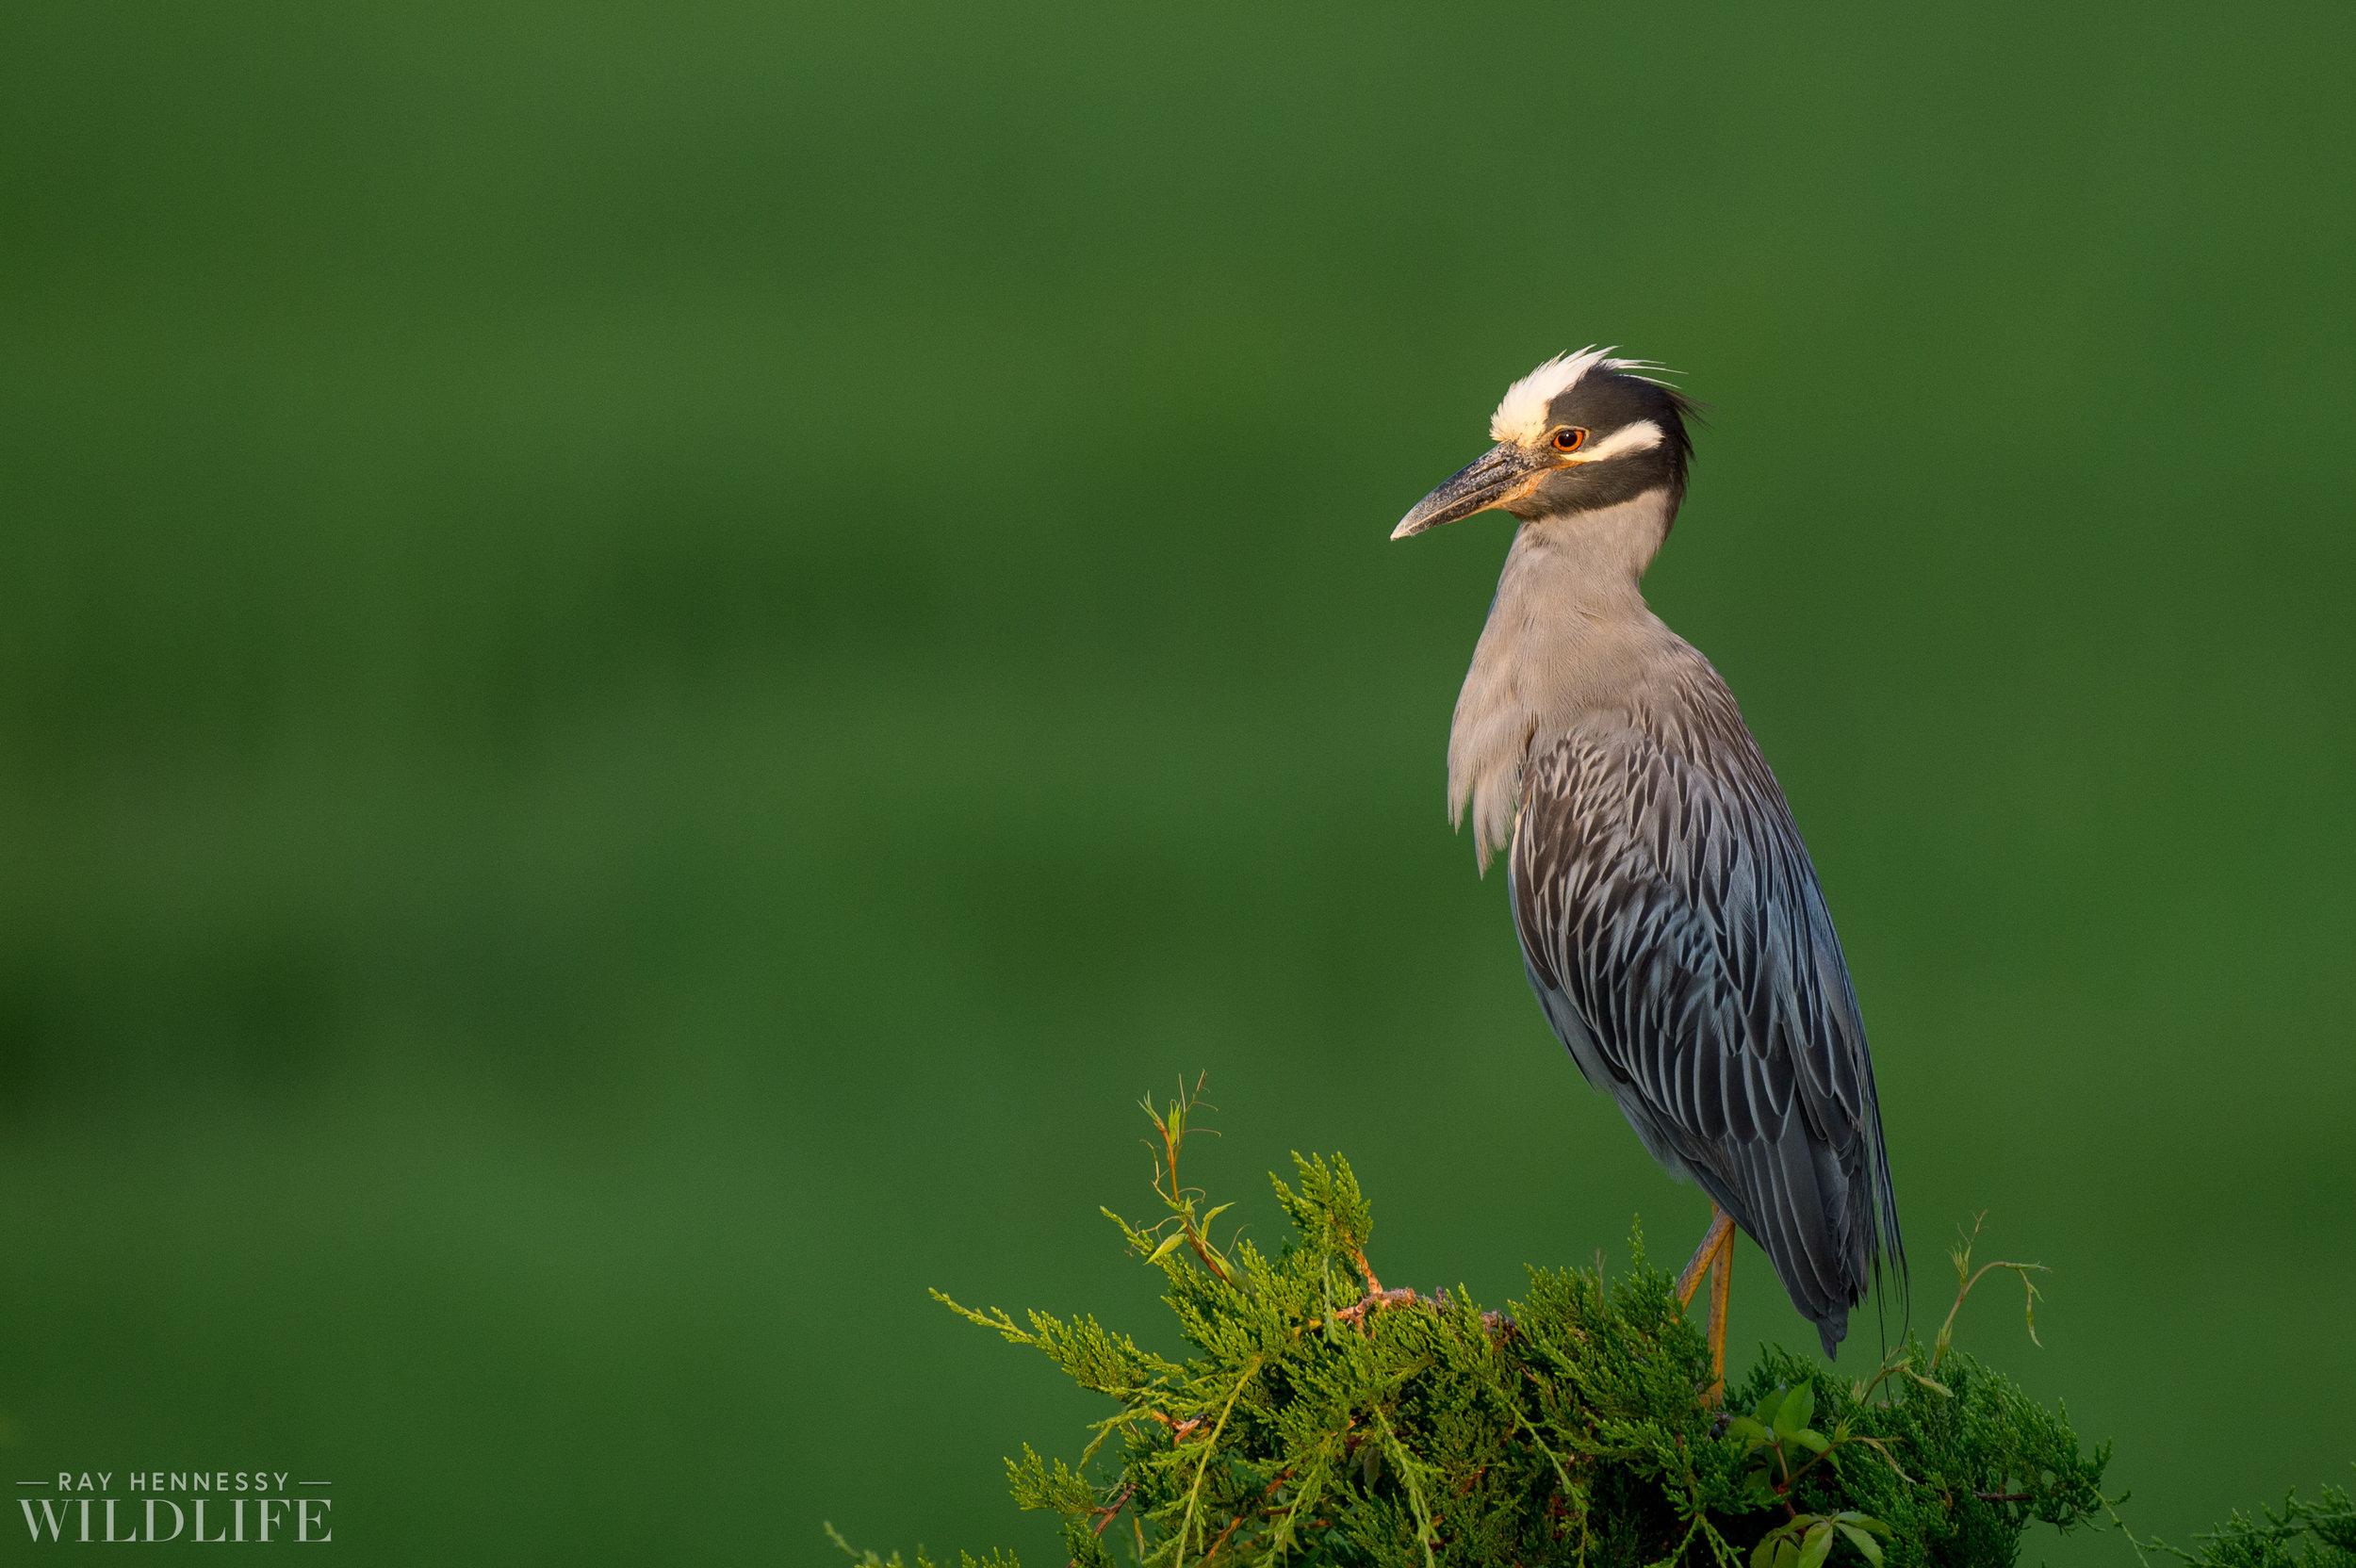 001_yellow-crowned-night-heron.jpg